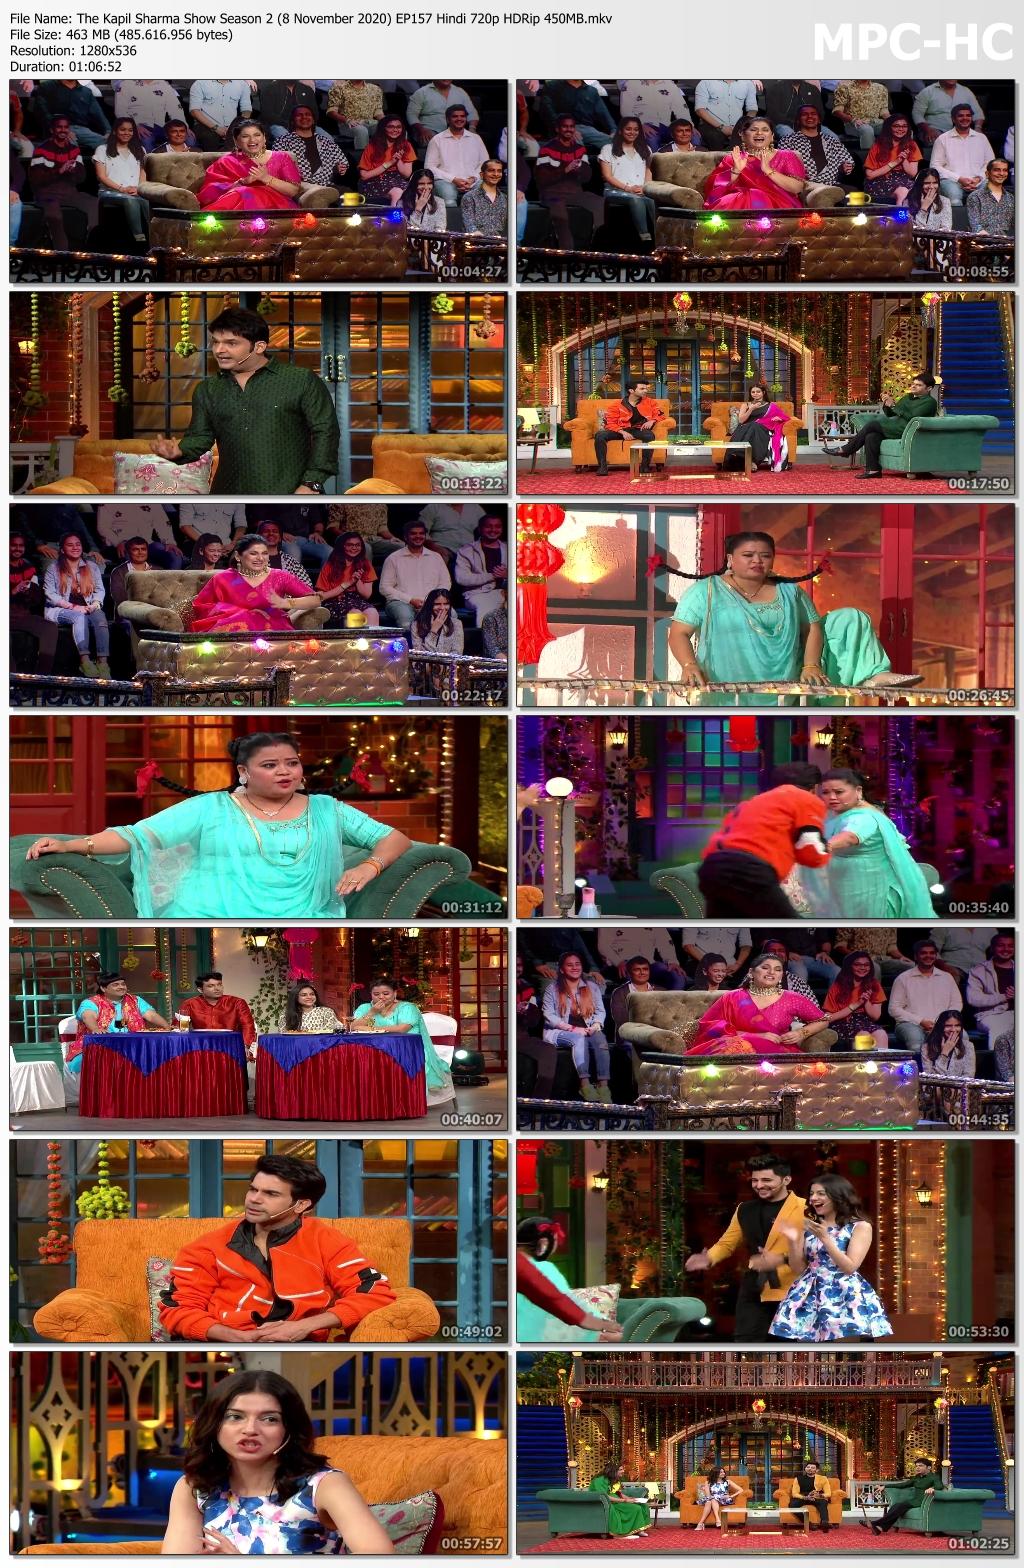 The-Kapil-Sharma-Show-Season-2-8-November-2020-EP157-Hindi-720p-HDRip-450-MB-mkv-thumbs